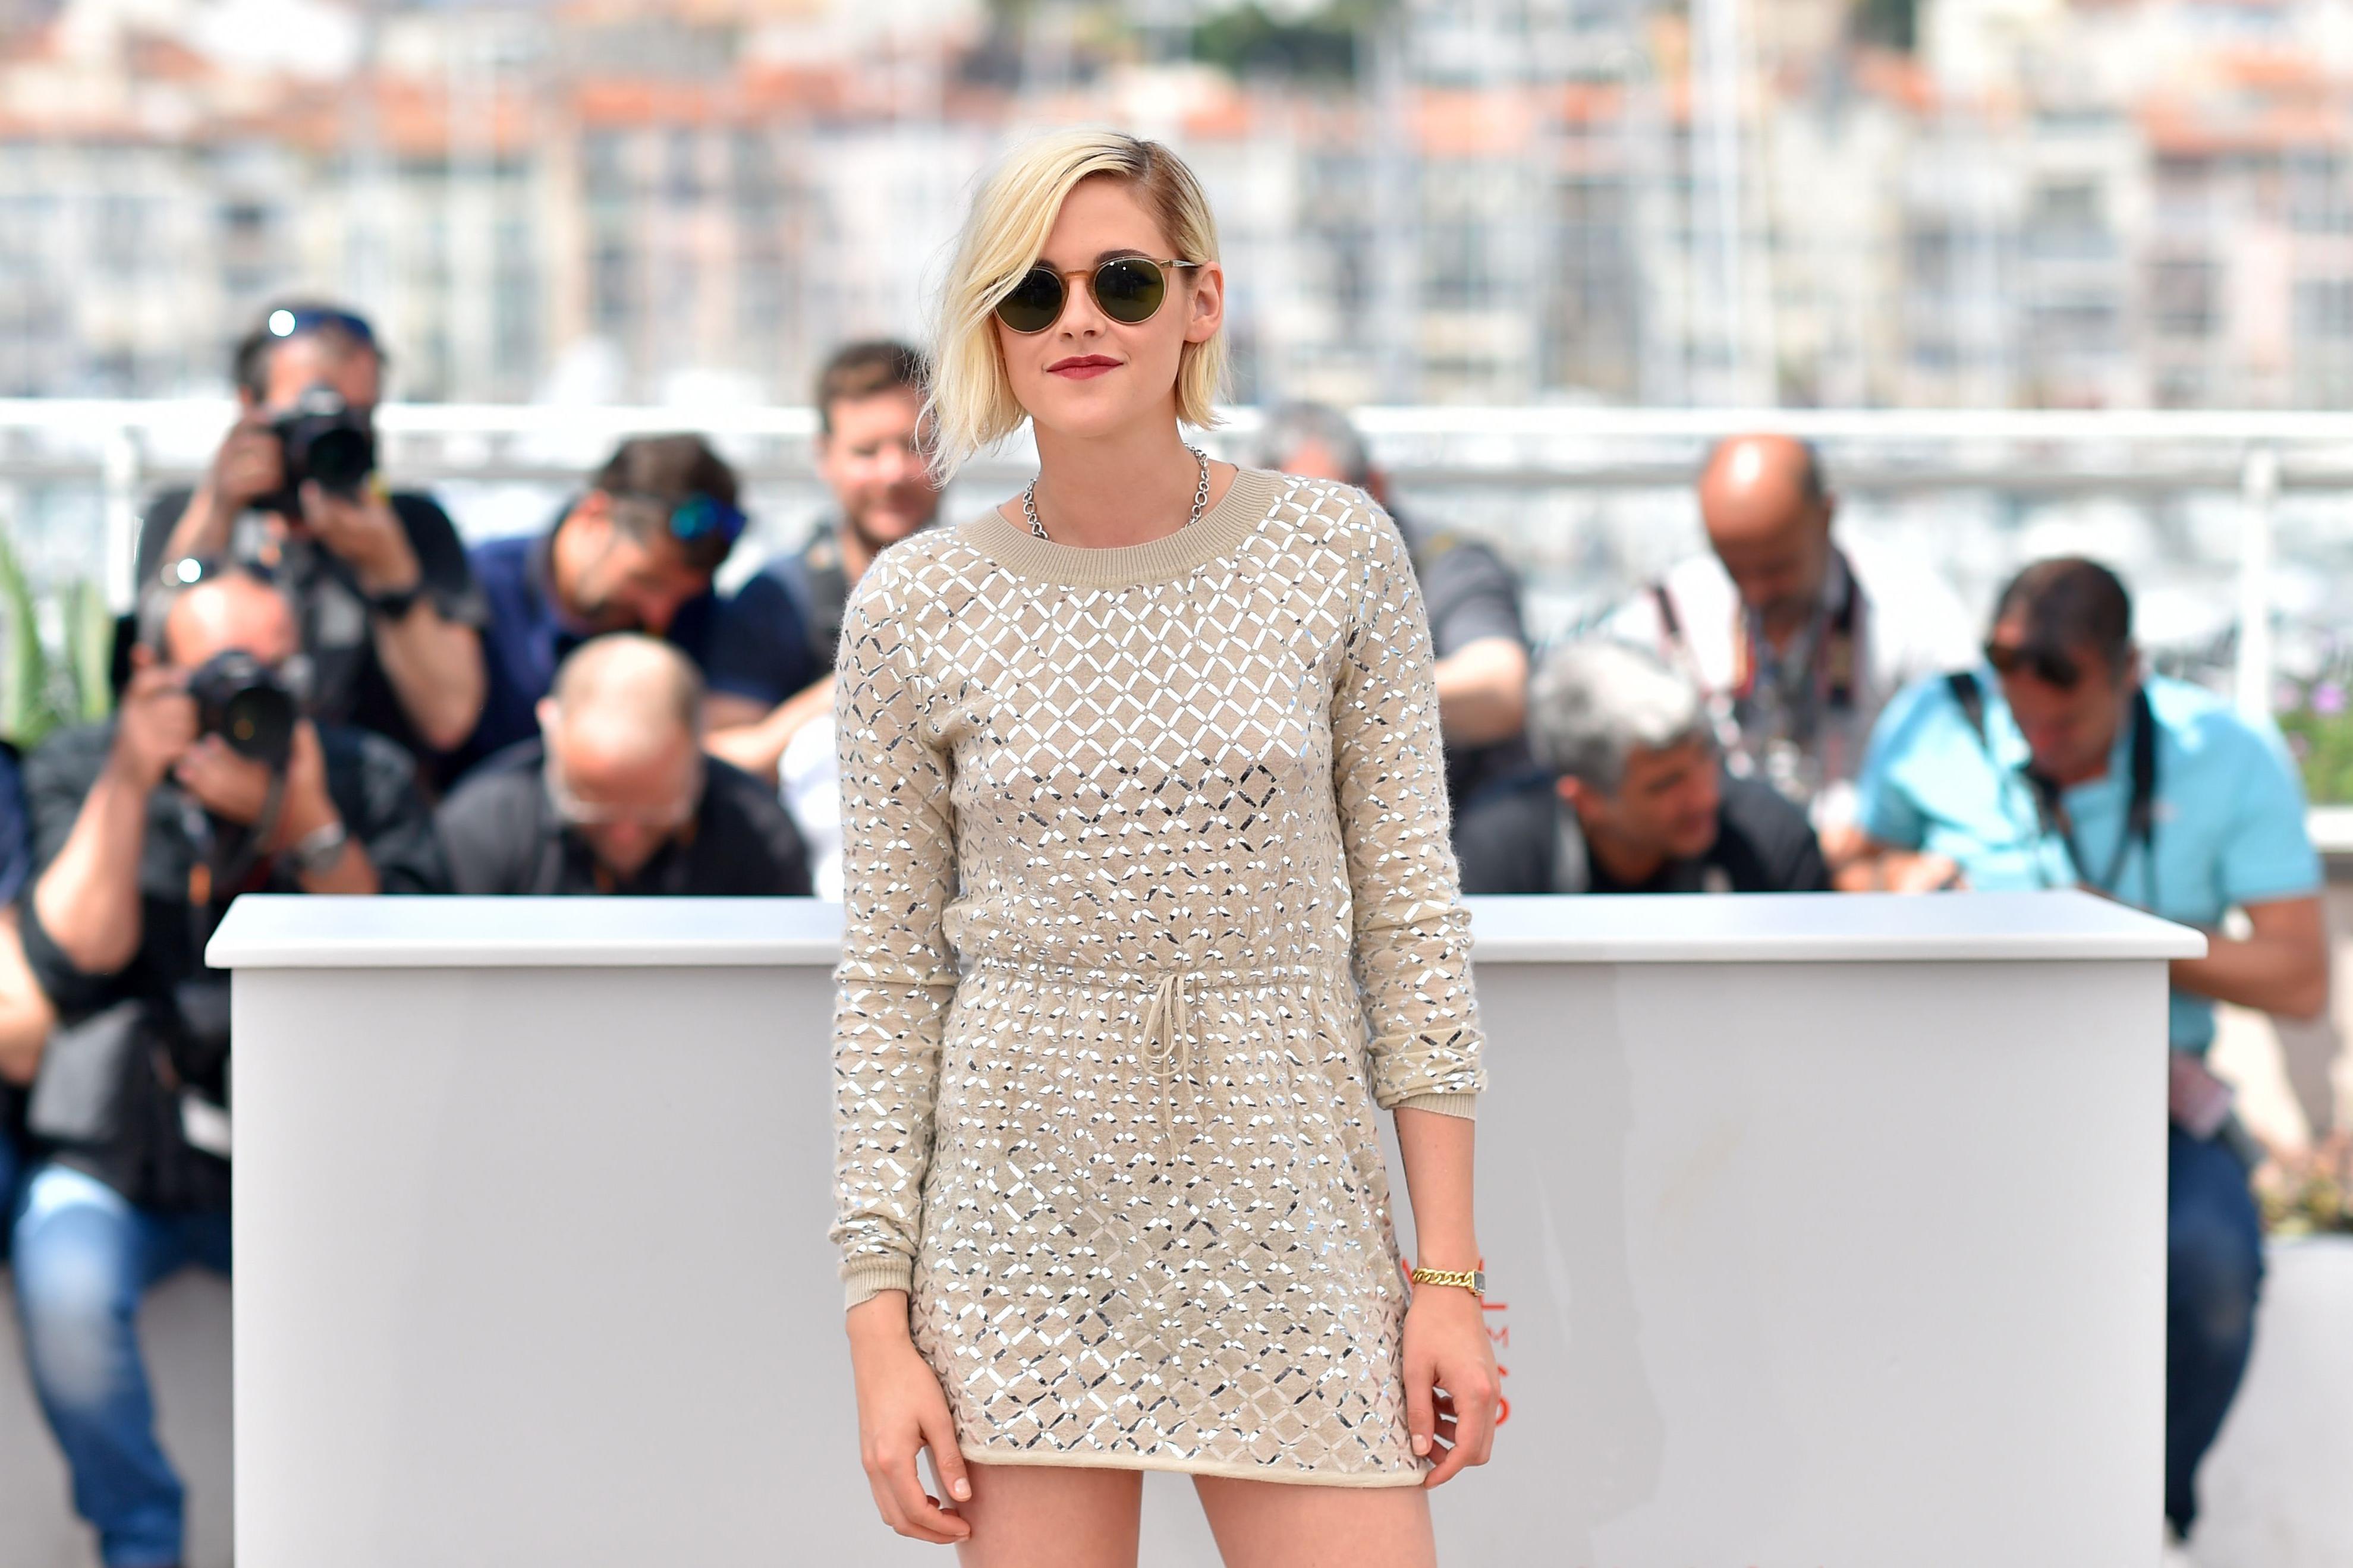 Kristen Stewart on May 17, 2016 in Cannes, France.